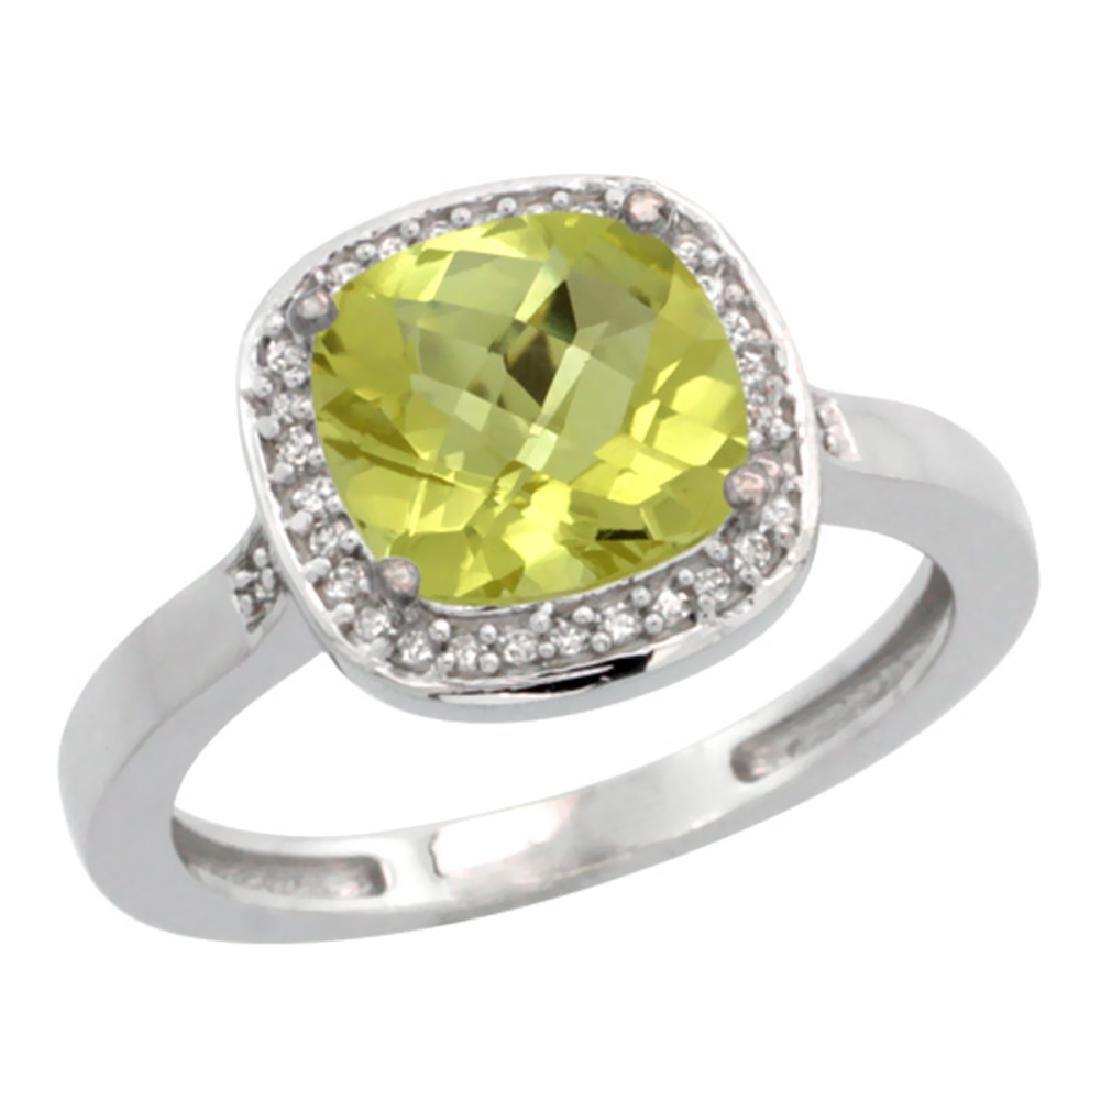 Natural 3.94 ctw Lemon-quartz & Diamond Engagement Ring